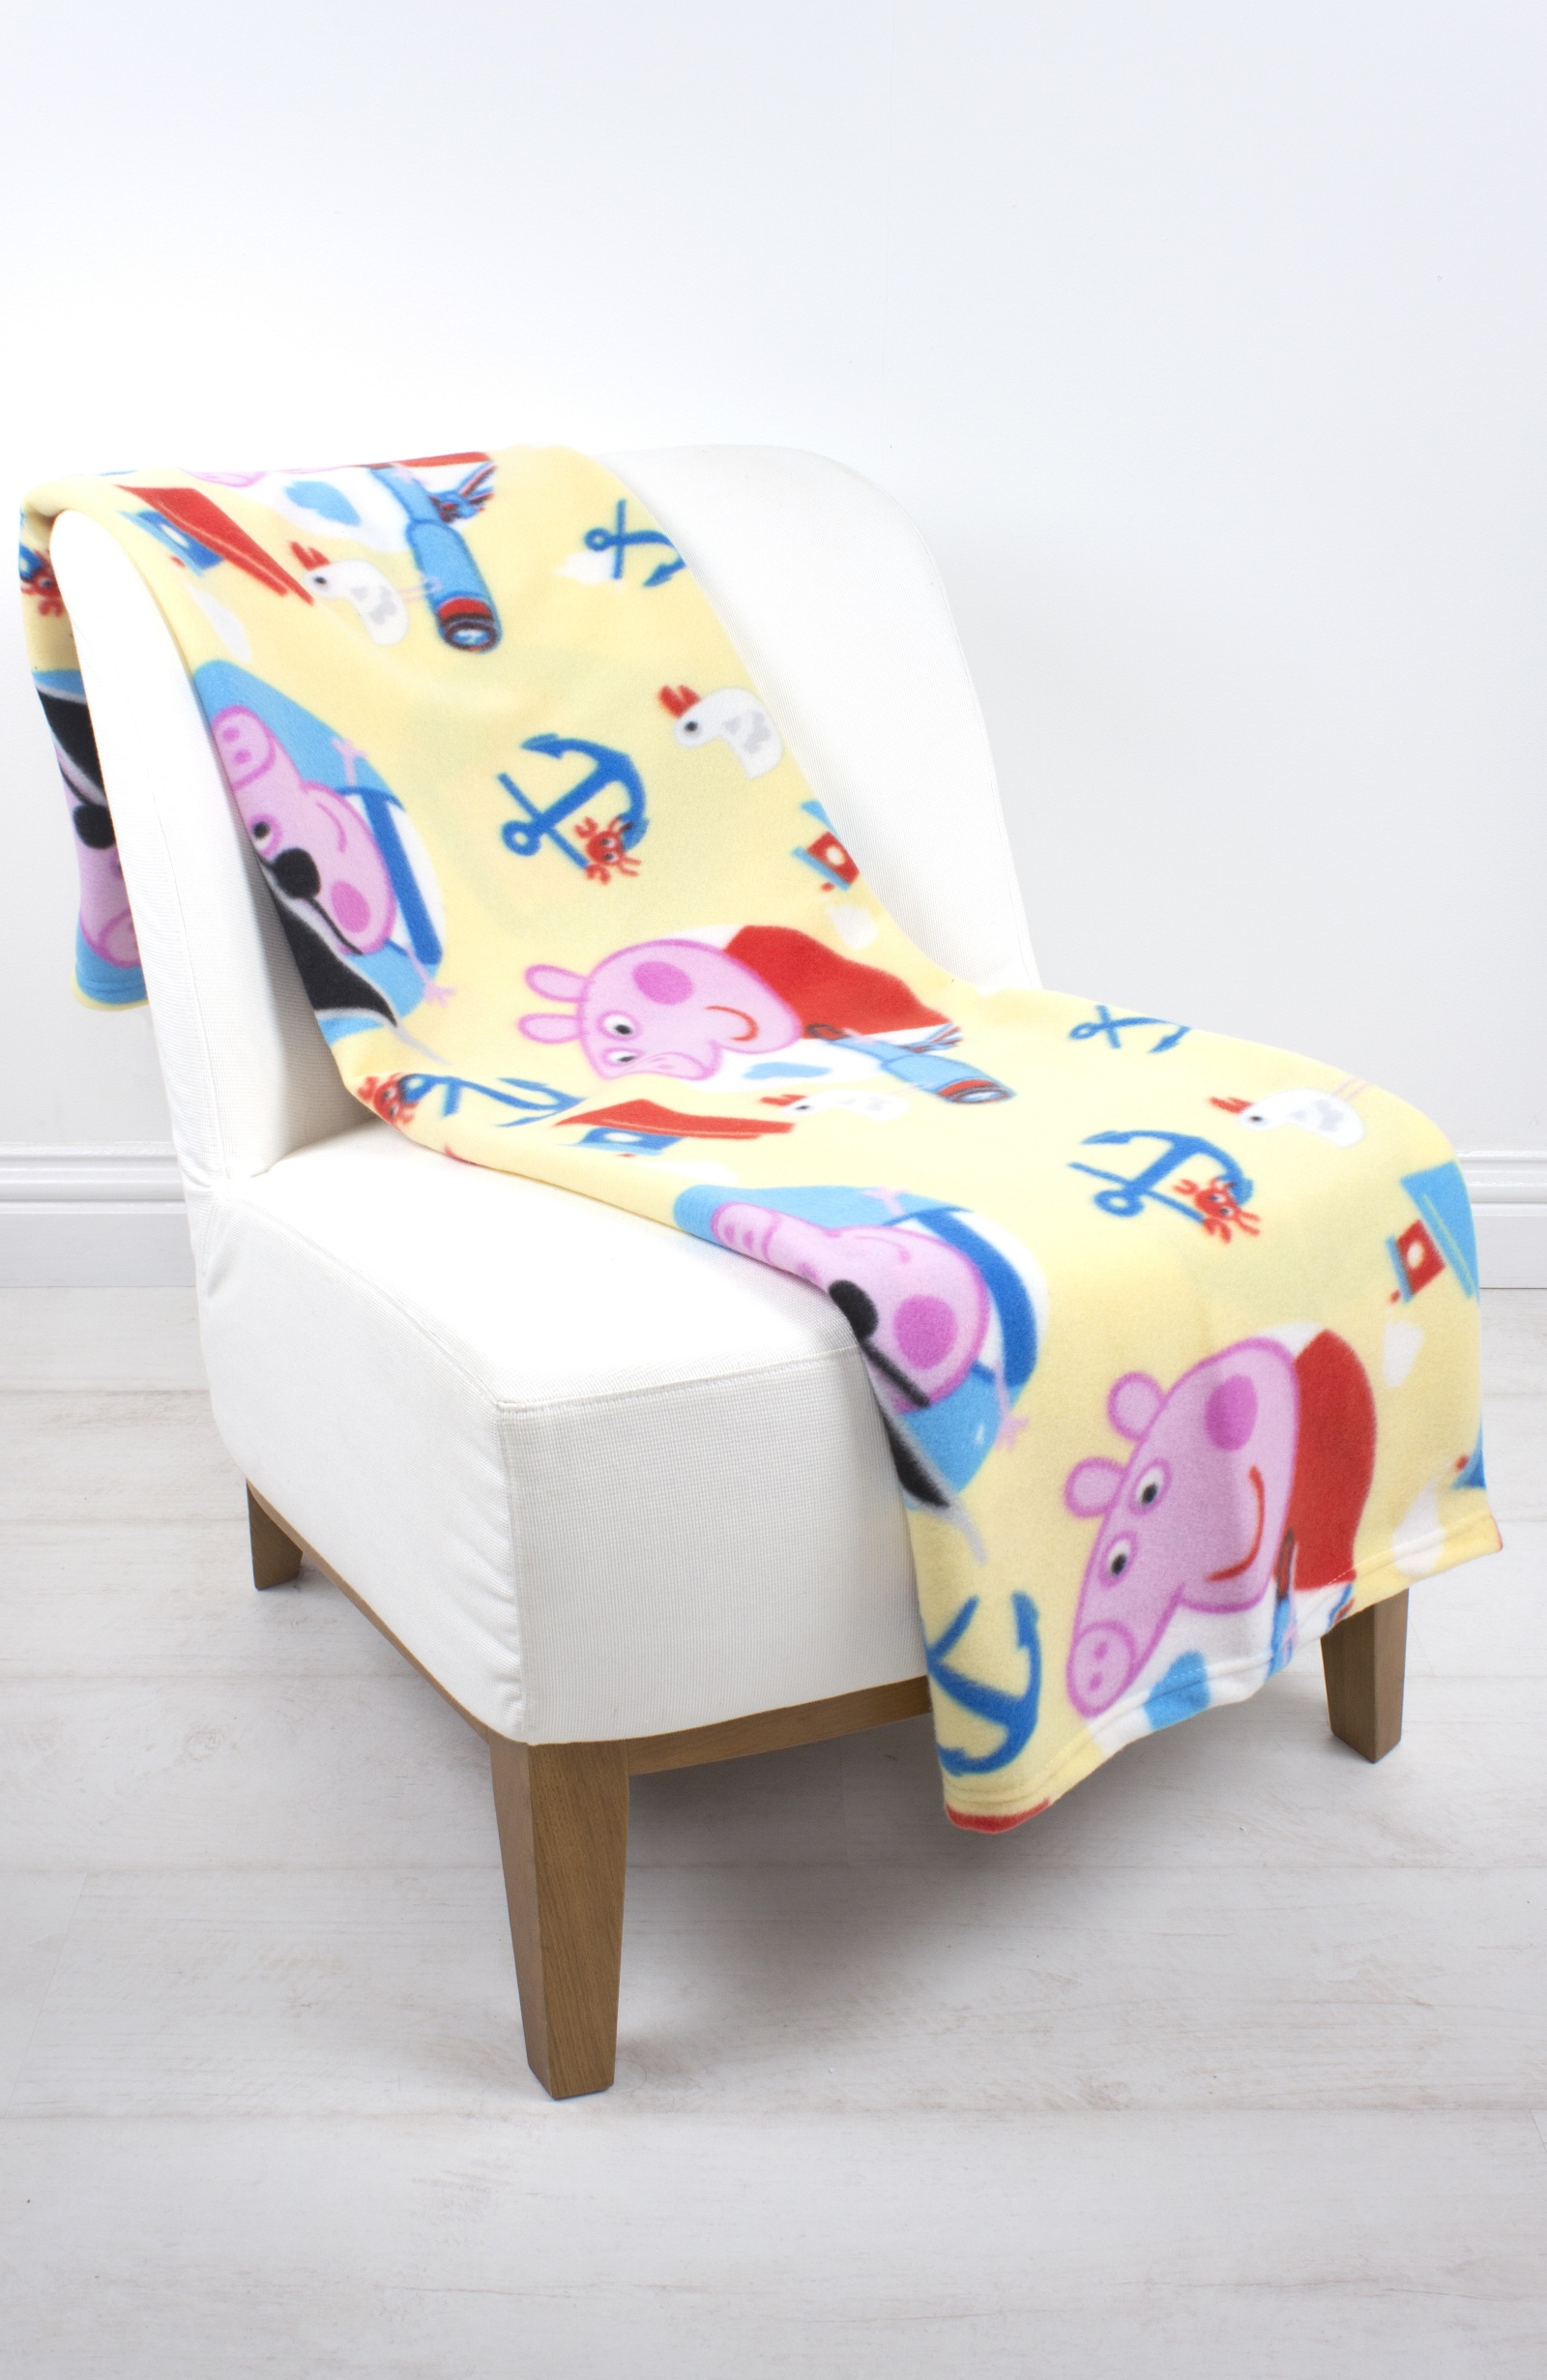 Extra Large Peppa Pig 39 Ocean 39 Fleece Blanket Sofa Throw